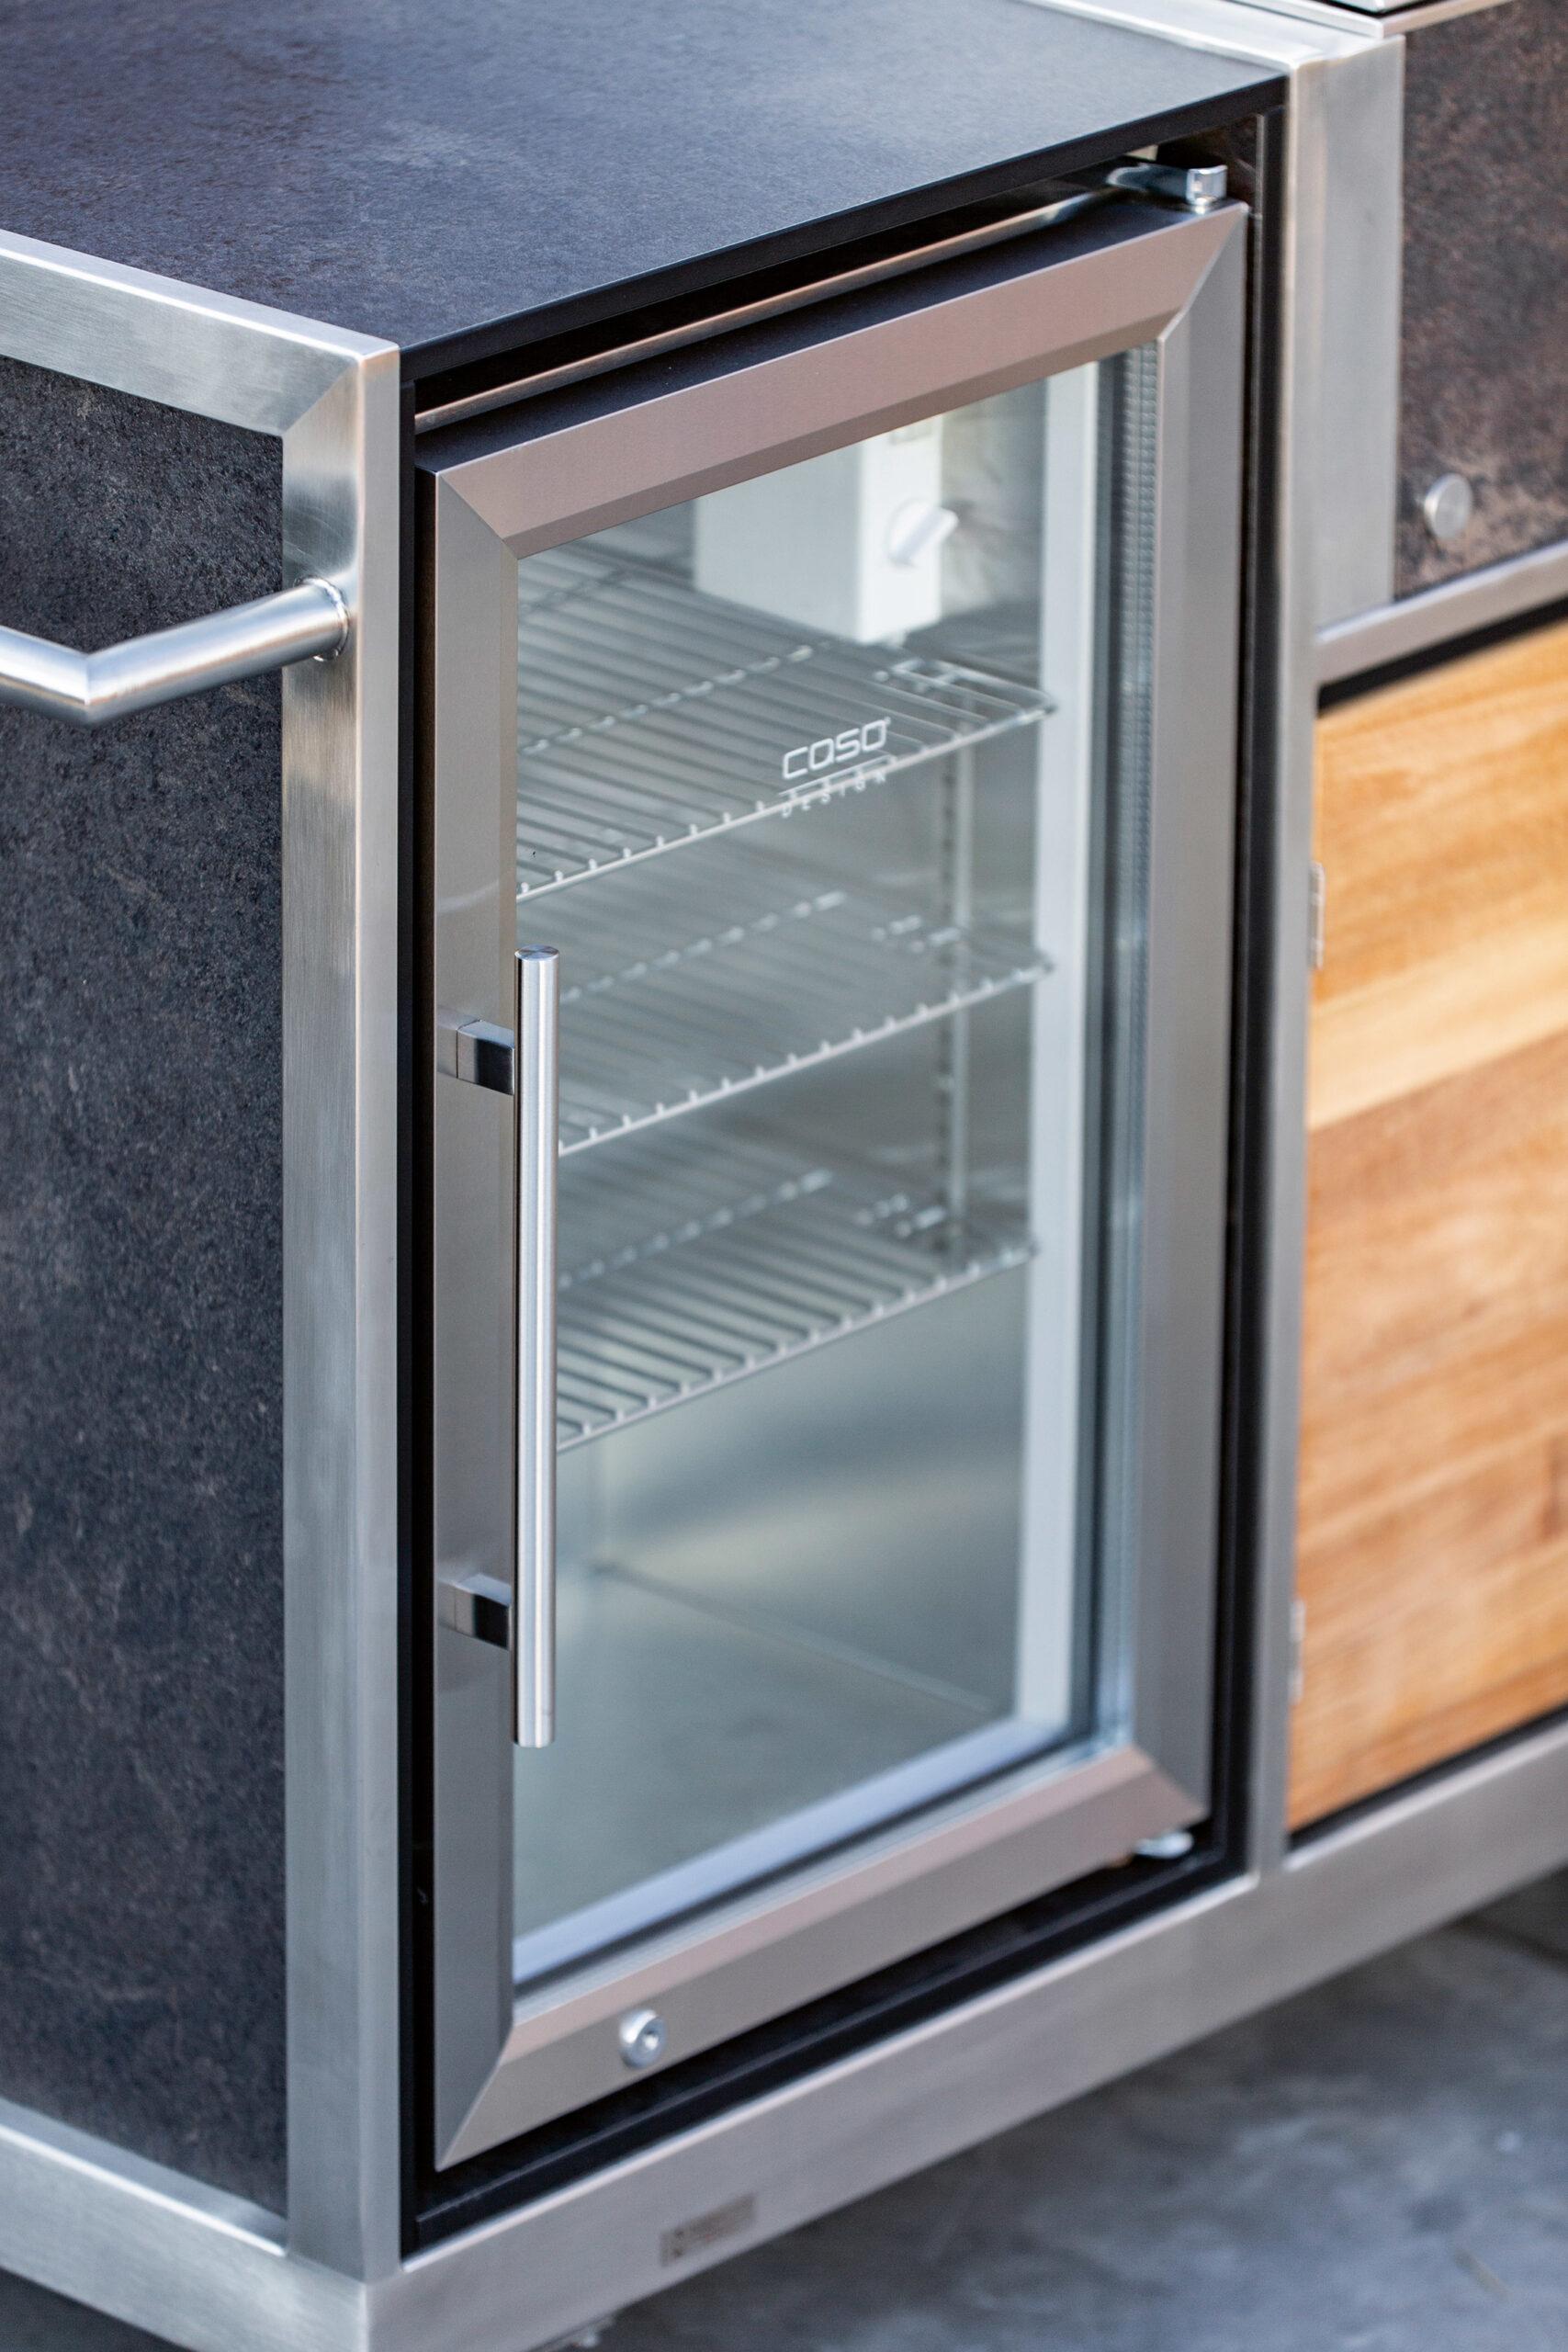 Full Size of Mobile Küche Wohnzimmer Mobile Outdoorküche